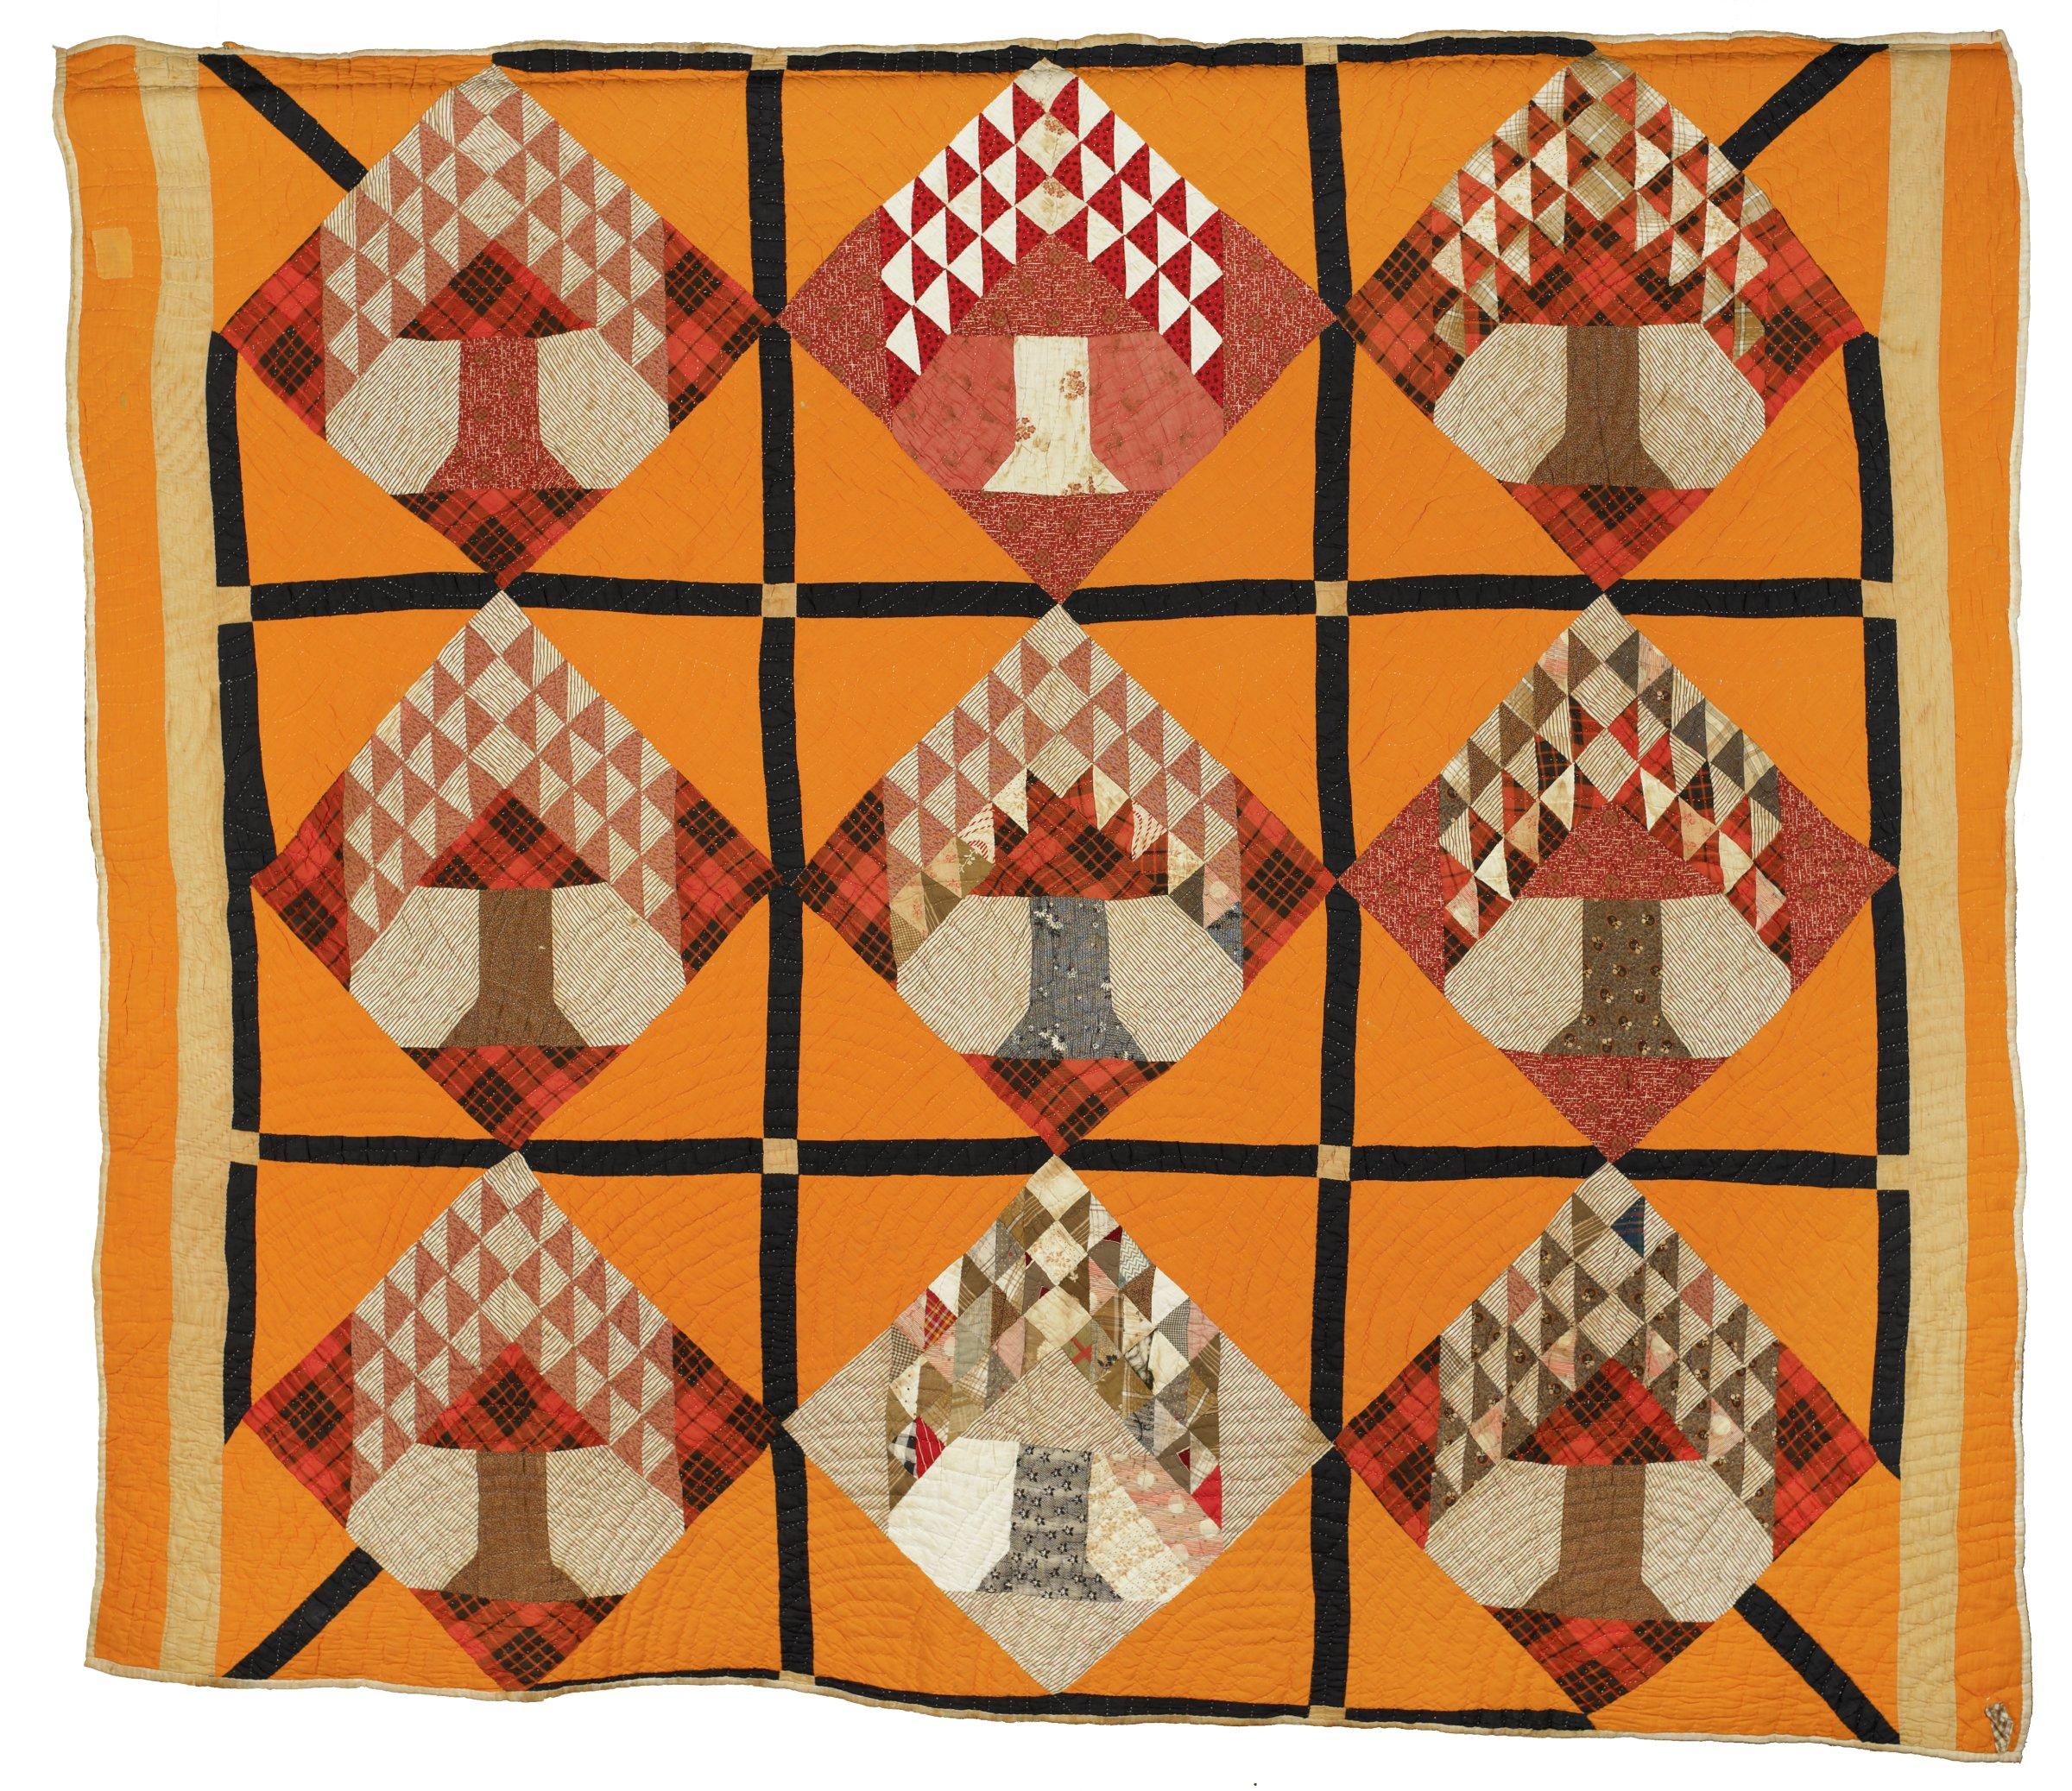 Tree of Life pattern has nine squares, each with tree inside diamond shape, against orange background